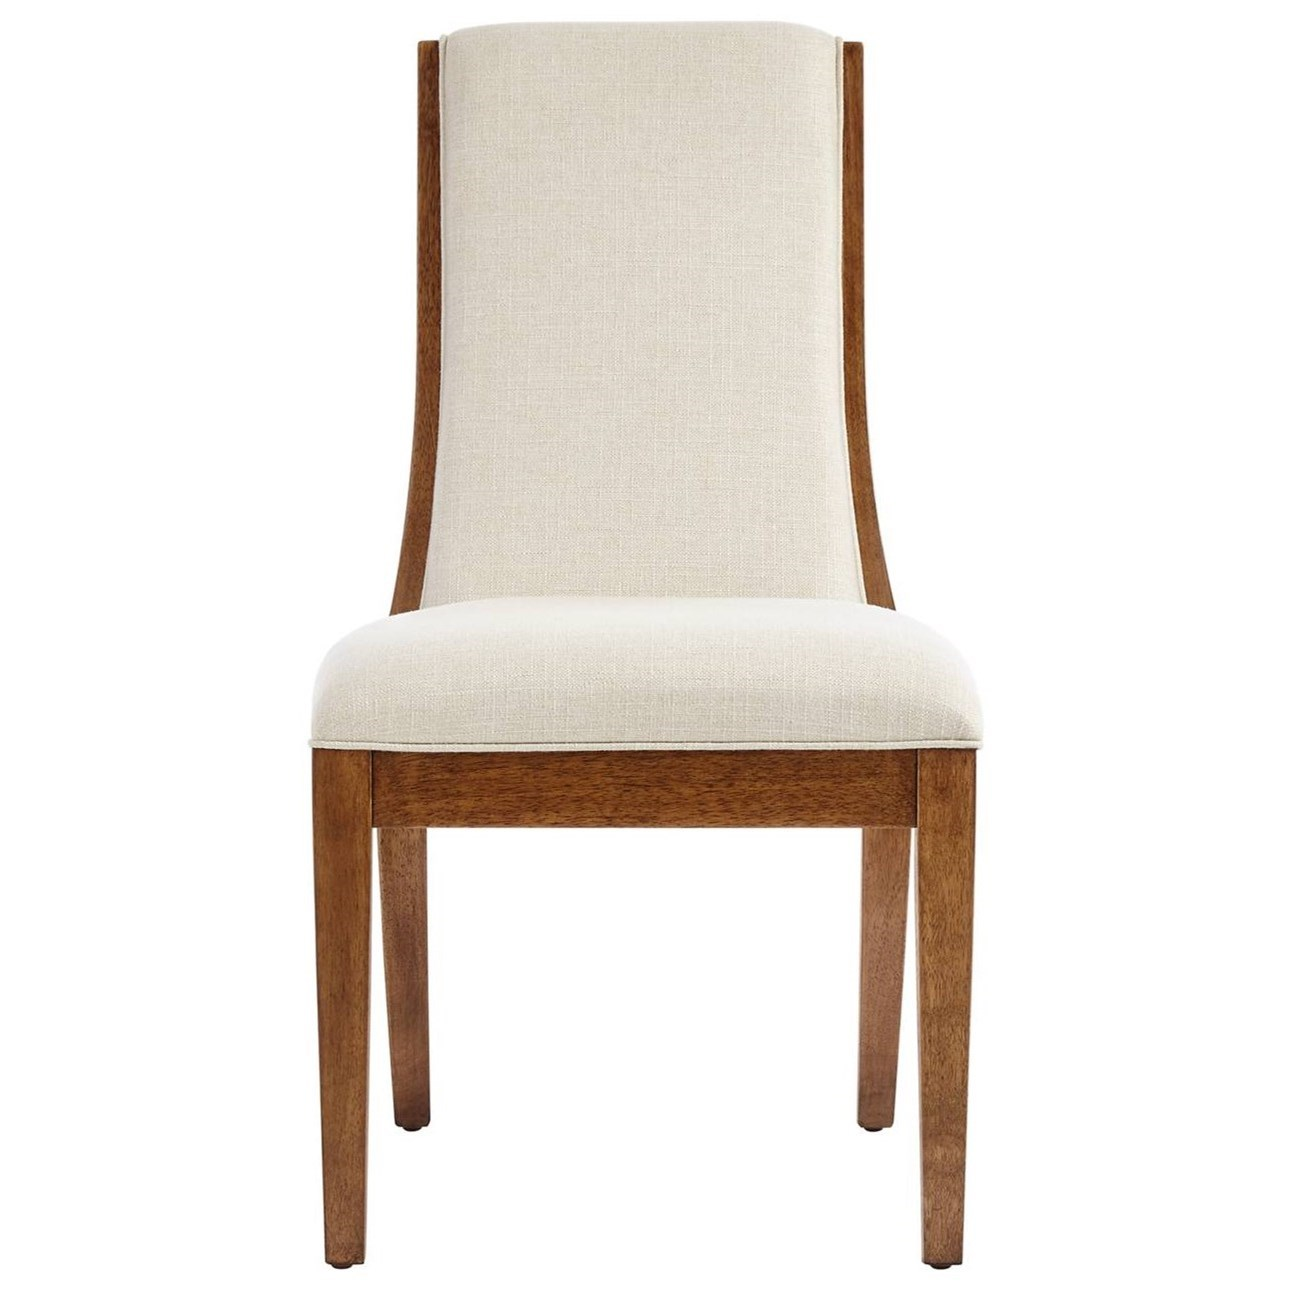 Stanley Furniture Panavista Madagascar Side Chair - Item Number: 704-11-65